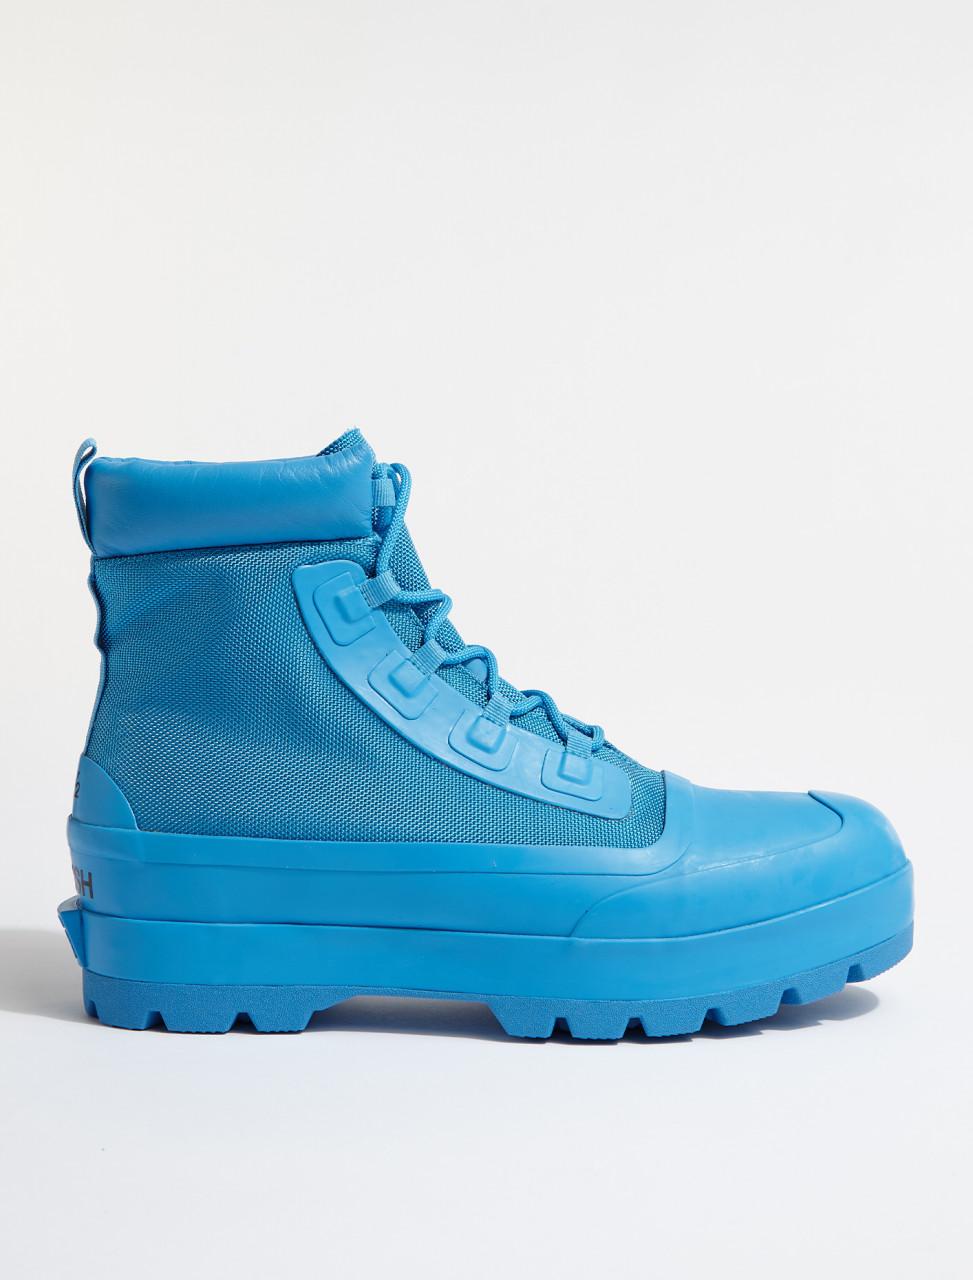 x AMBUSH Duck Boot High Sneaker in Blithe